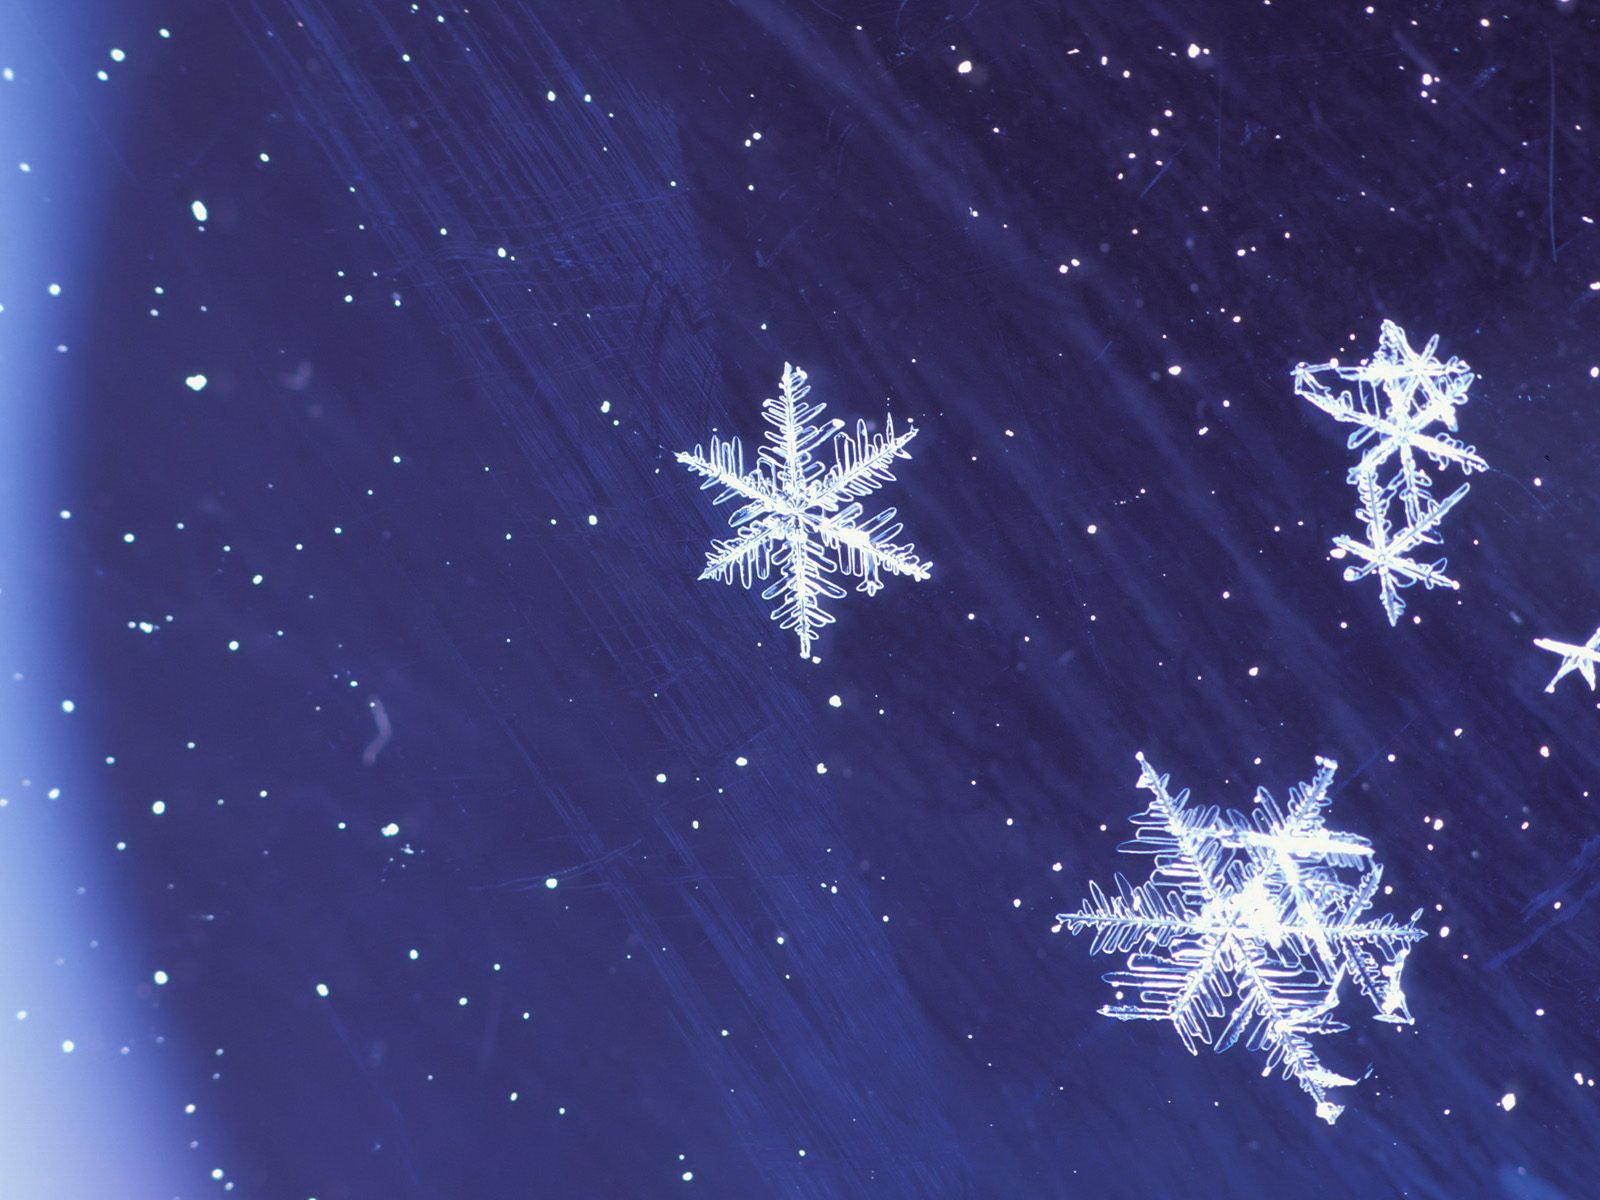 Конкурс картинки, картинки на телефон анимация снег